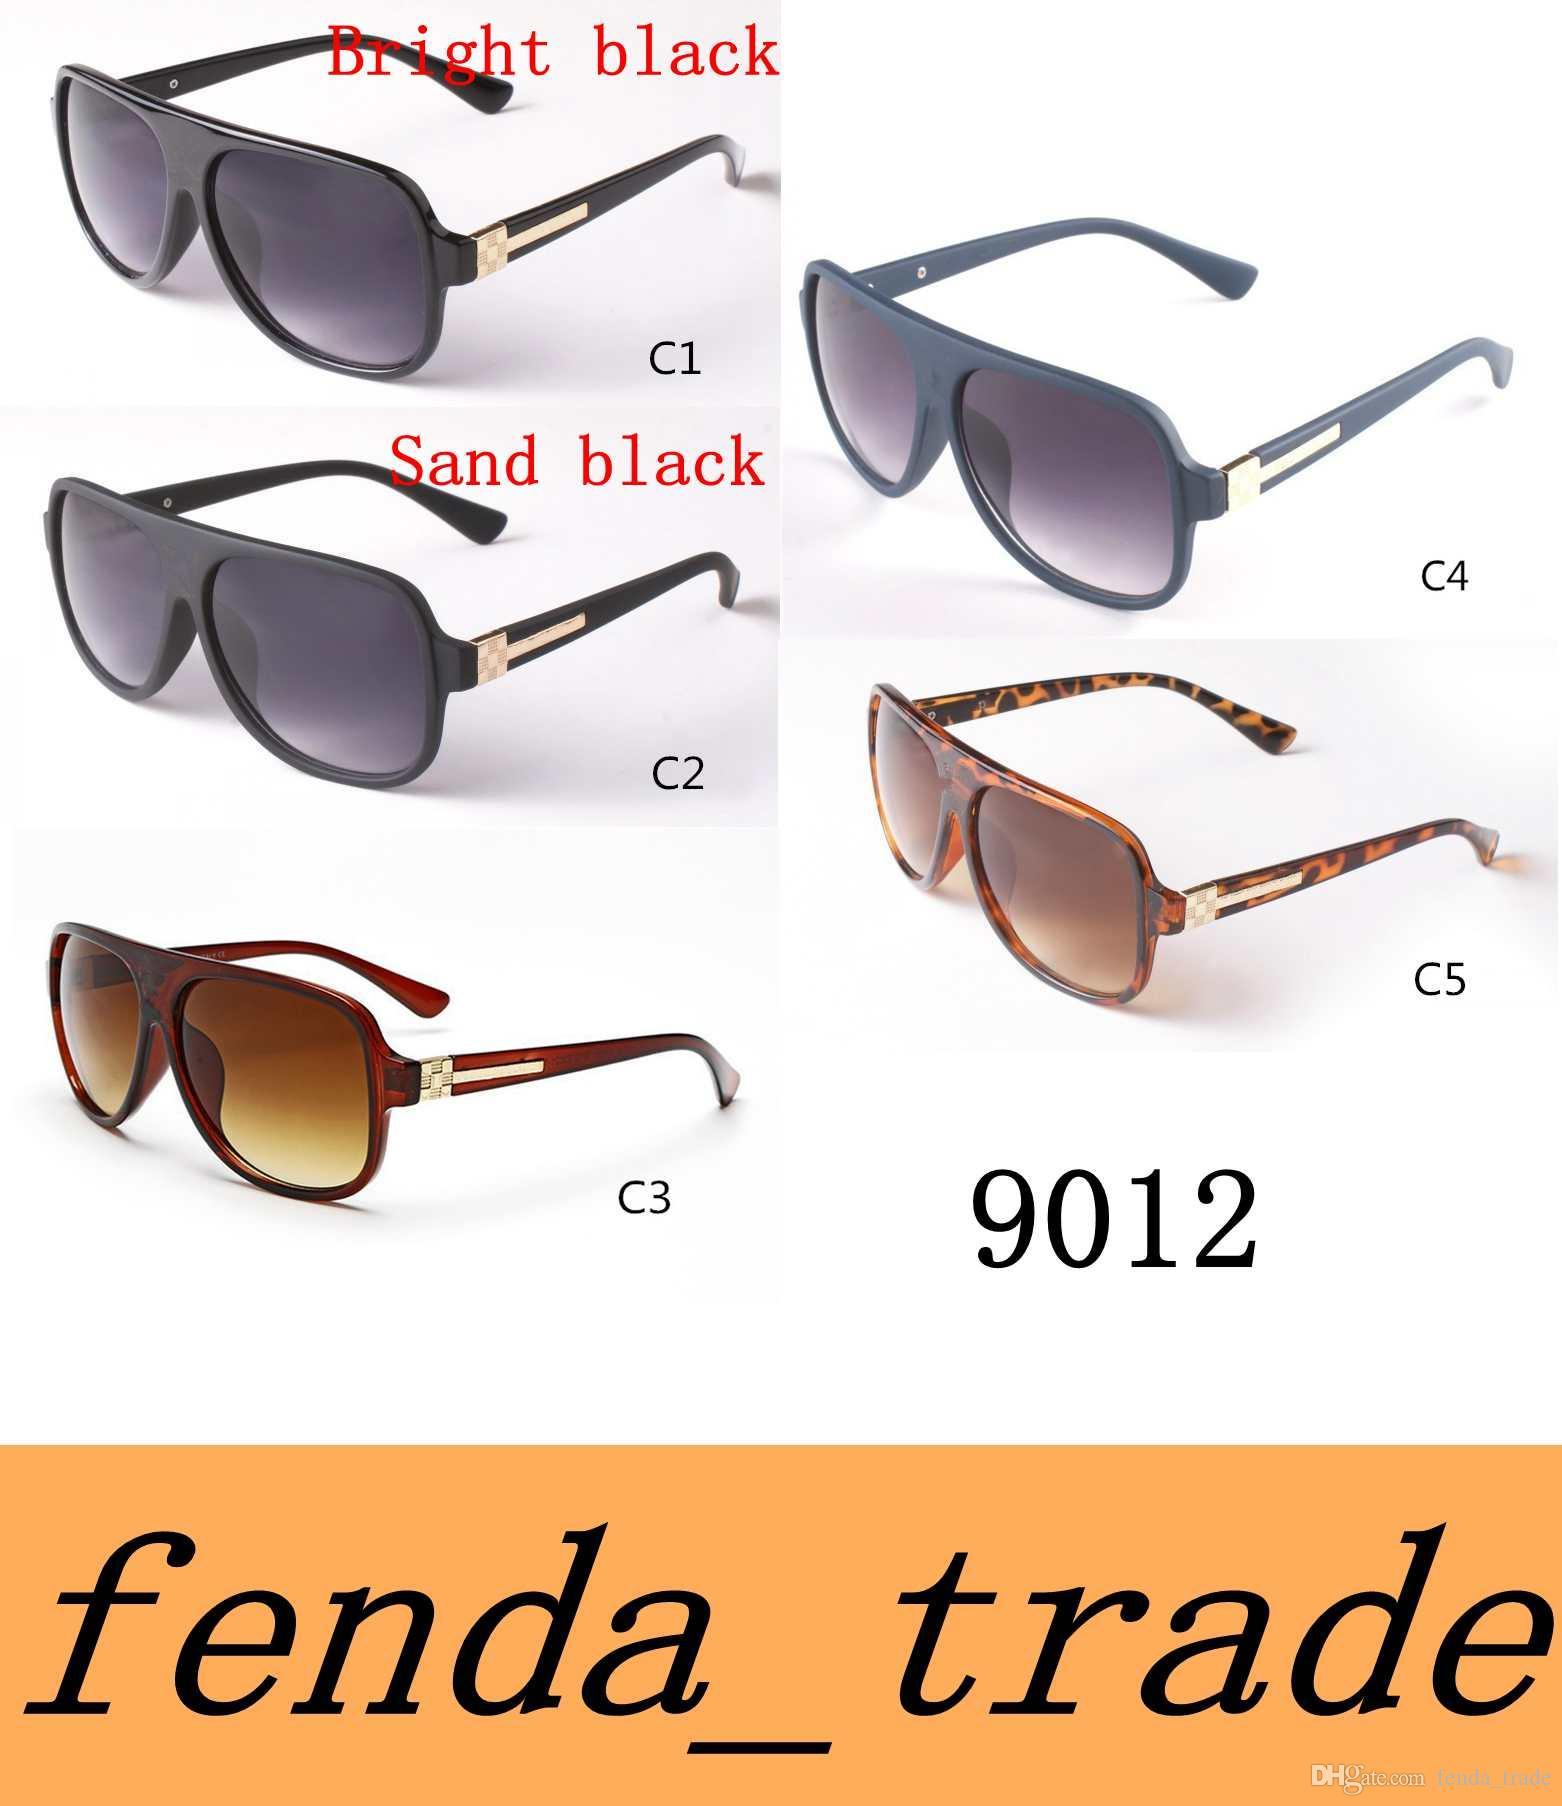 9a1841cbcbf5 NEW 2017 Brand Designer Men Women Retro Flat Top Sunglasses Vintage Acetate  Shaded Lens Thin Shadow Glasses 9012 High Quality Lens MOQ 10 Designer ...